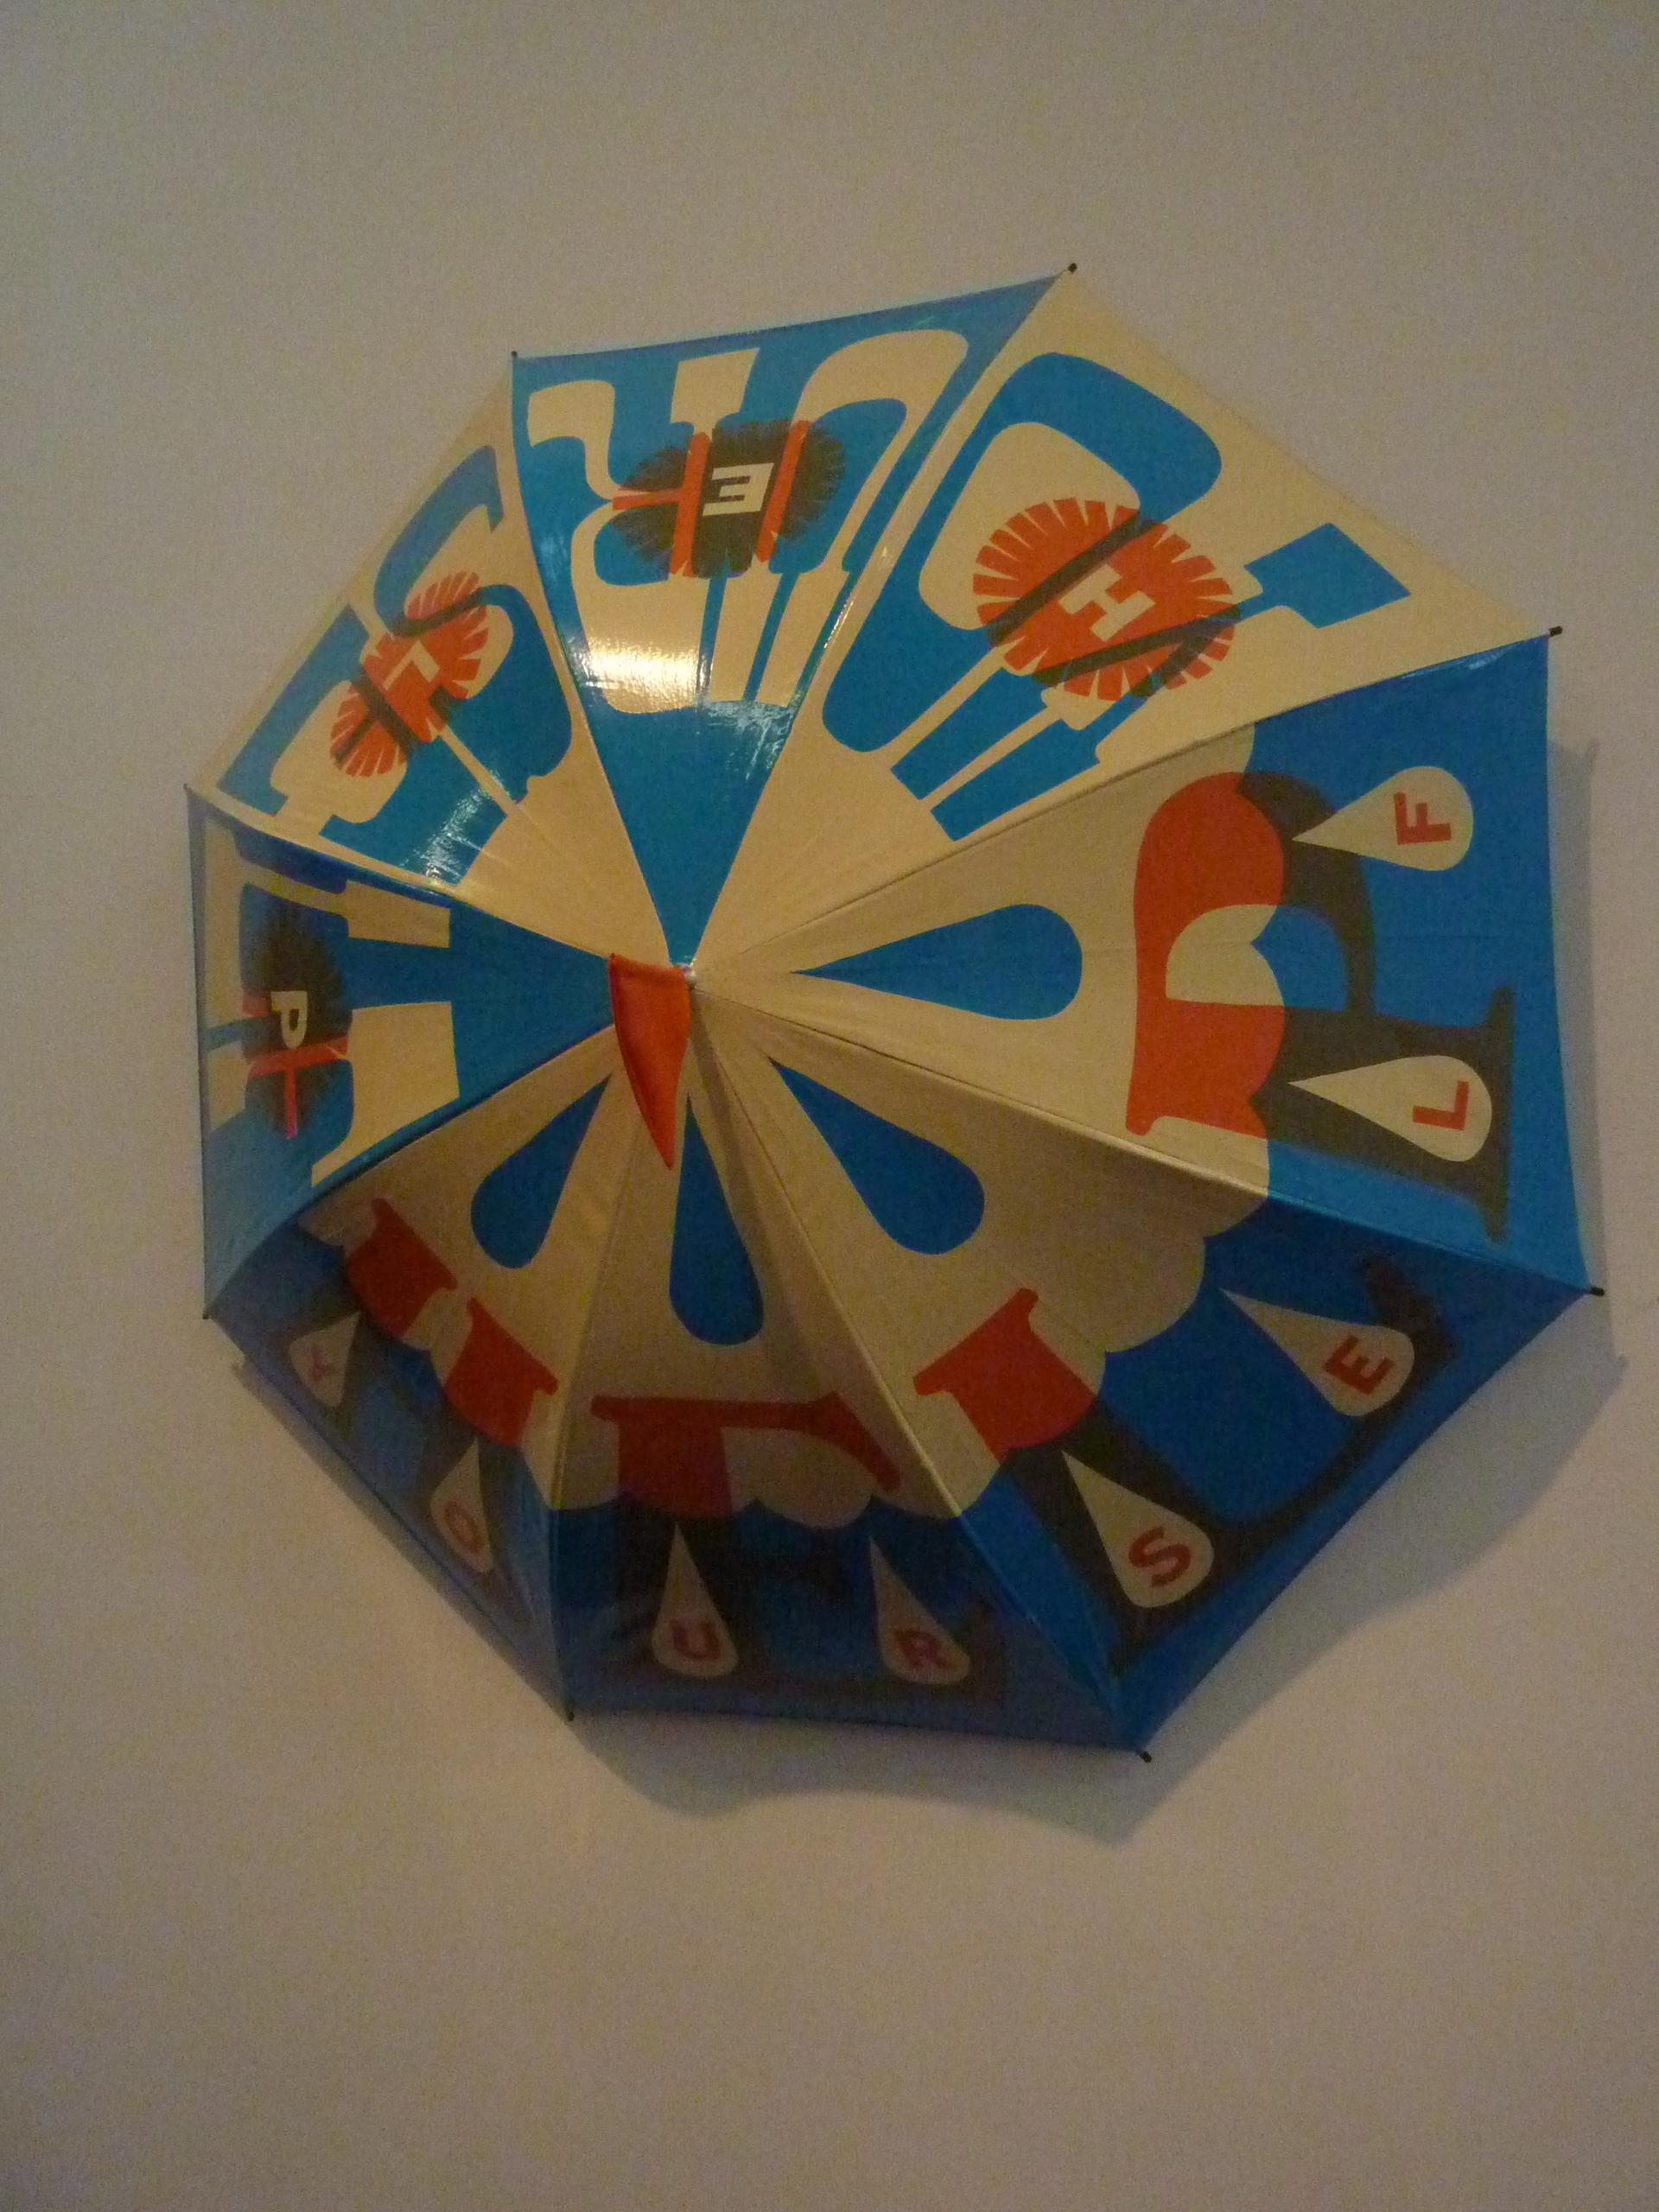 ORIG-umbrella-by-damon-help-yourself-to-jeff-canham_5885593978_o.jpg